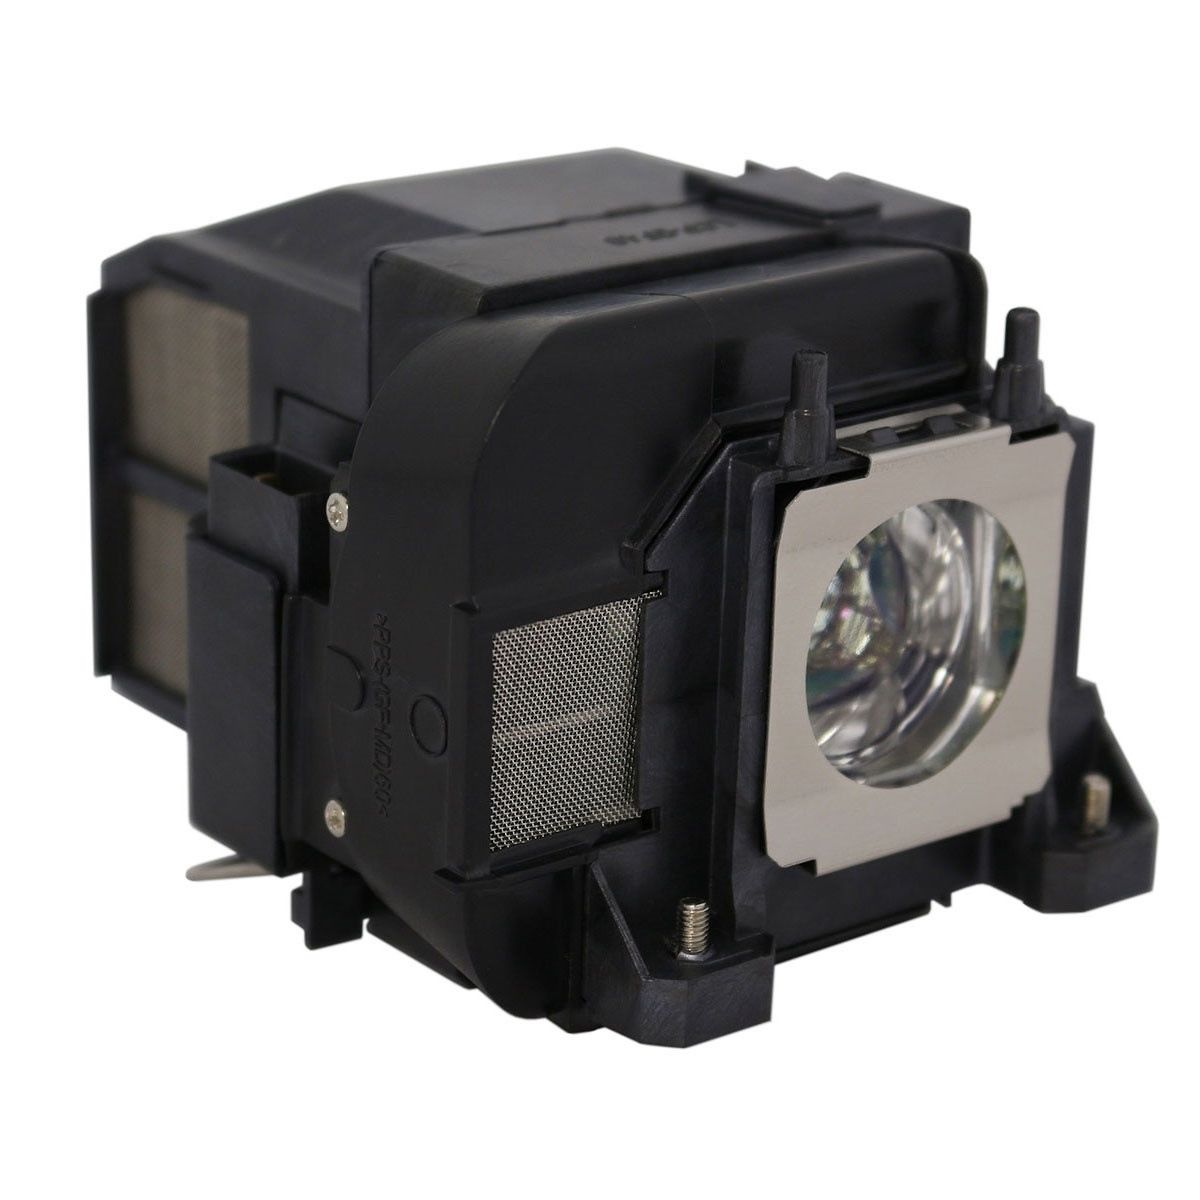 ELPLP77 V13H010L77 for EPSON PowerLite 4650/4750W/4855WU/G5910 EB-4550 EB-4650 EB-4750W EB-4850WU EB-4950WU Projector Lamp Bulb projector lamp with housing elplp77 for eb 1970w eb 1975w eb 1980wu eb 1985wu eb 4550 eb 4650 eb 4750w eb 4850wu eb 4950wu